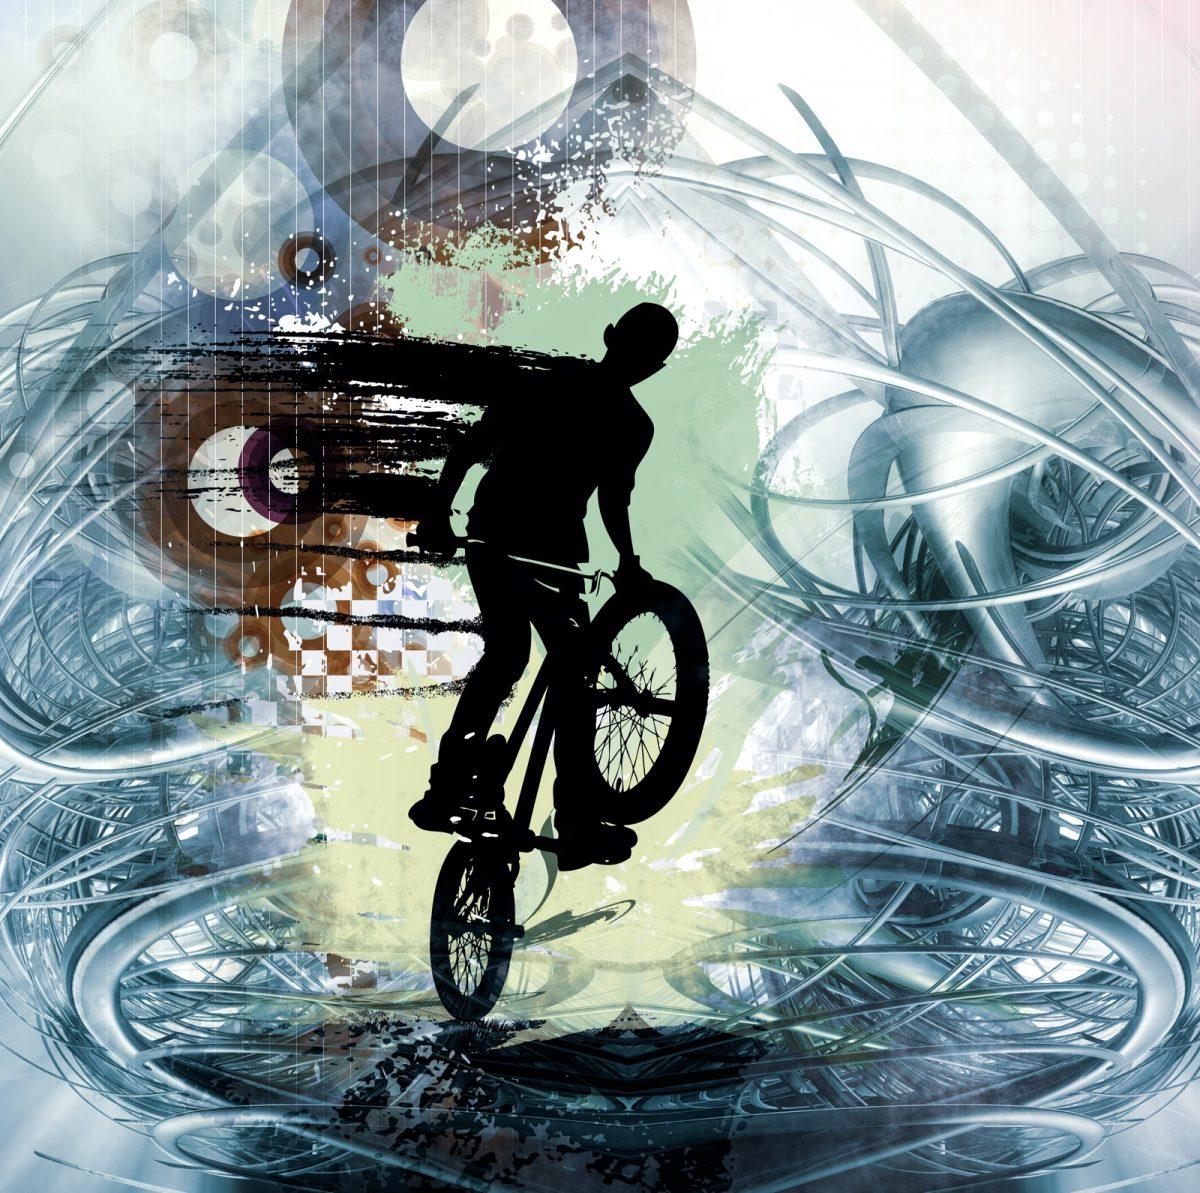 Kid doing a bike stunt against futuristic background